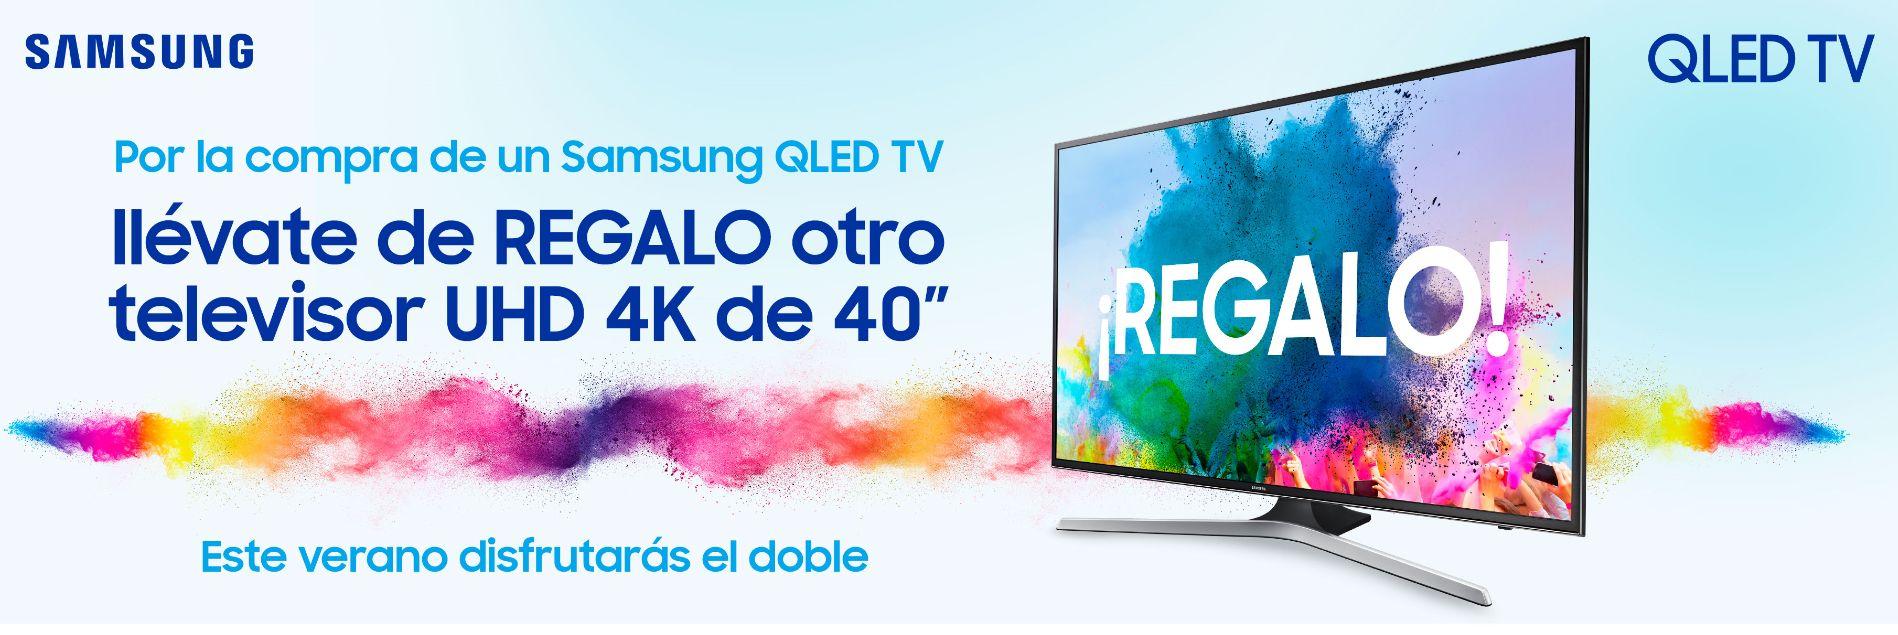 Promocion Samsung Qled Disfruta El Doble Samsung Televisor